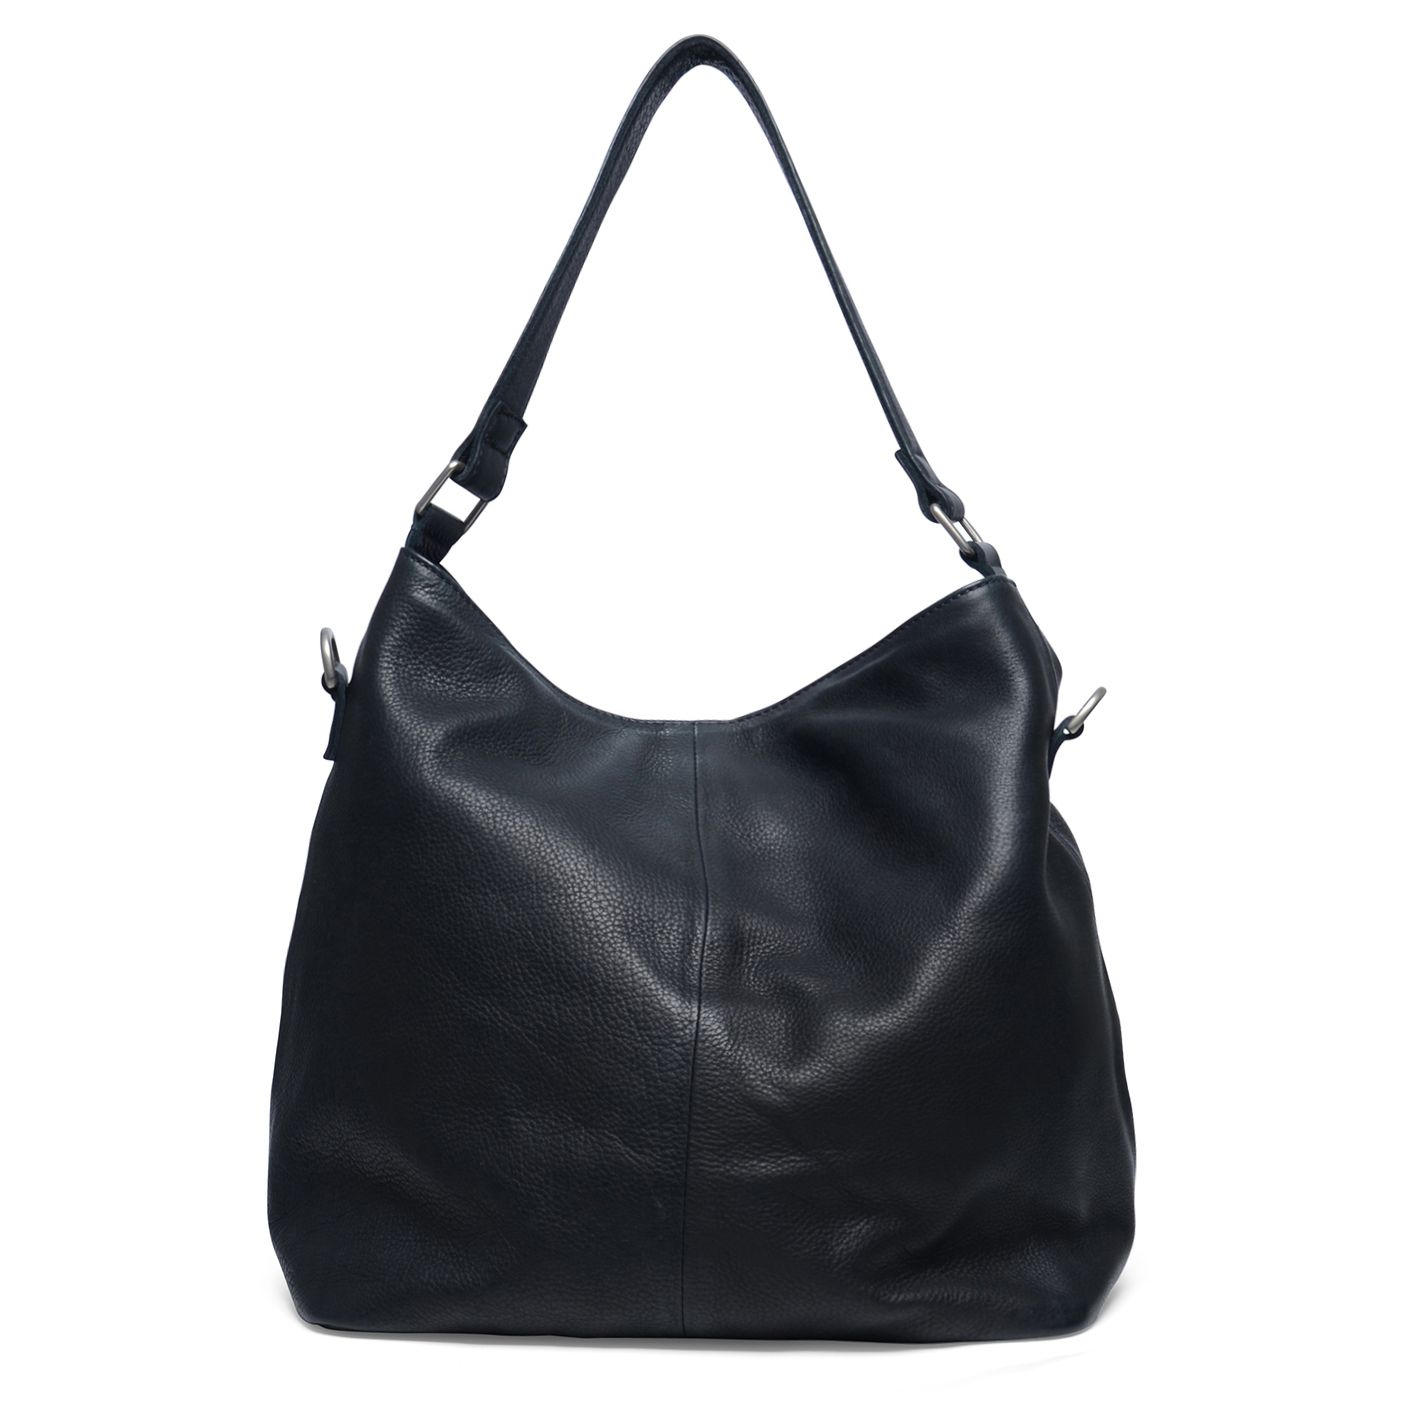 Zwarte Leren Schoudertassen : Zwarte leren handtas tassen  sacha be